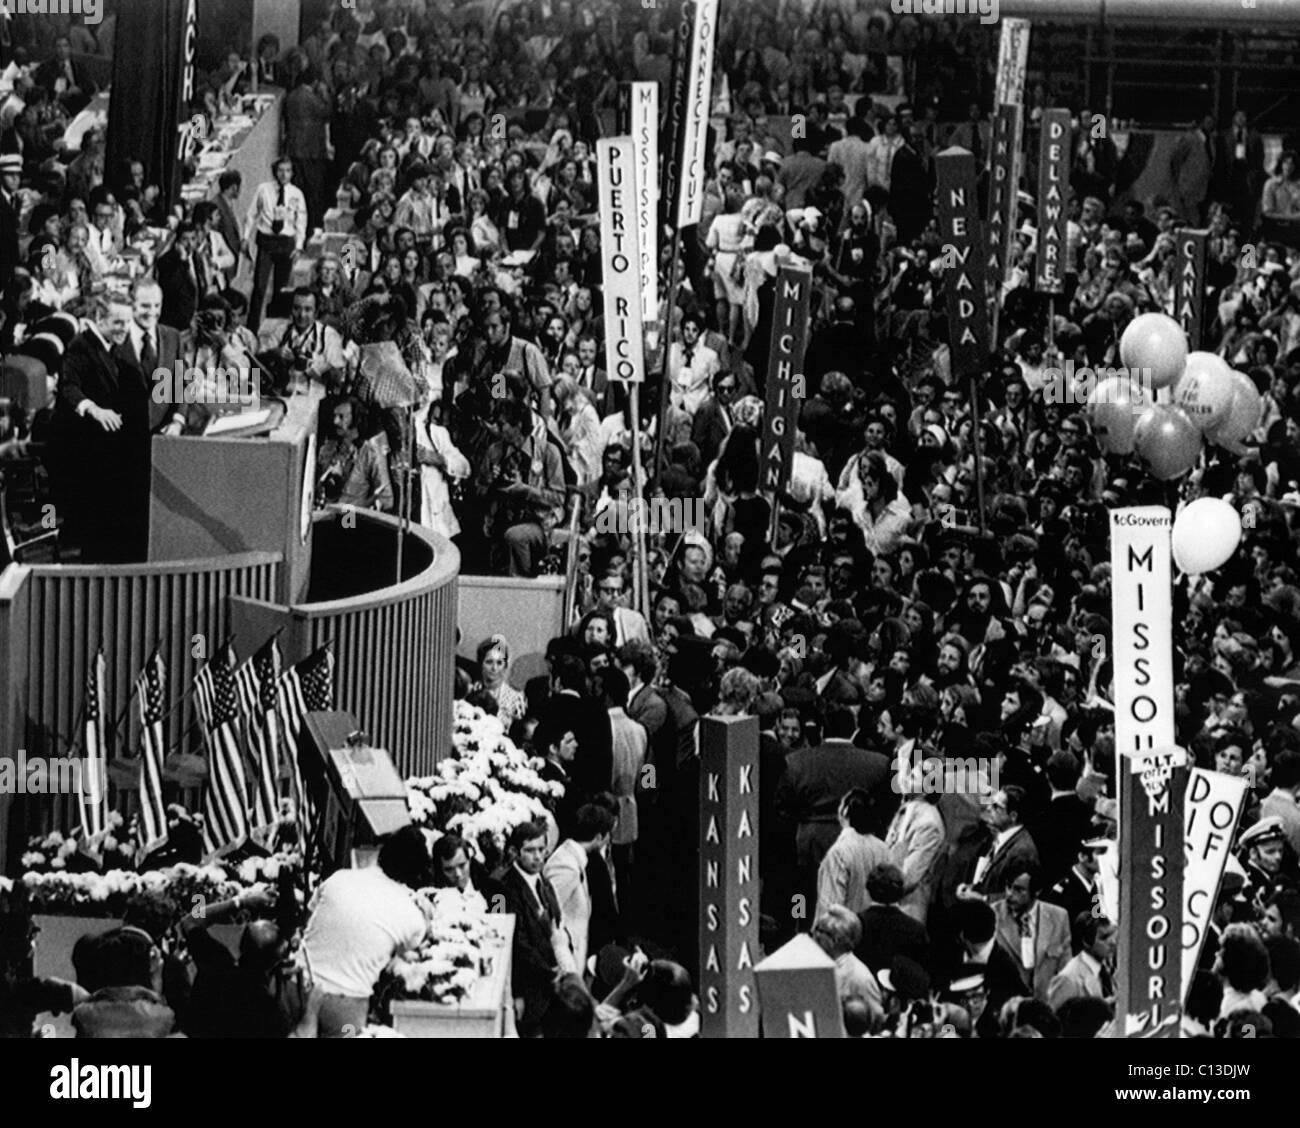 US Elections. At podium, from left: US Senator Thomas Eagleton and US Senator George McGovern accept the nominations - Stock Image